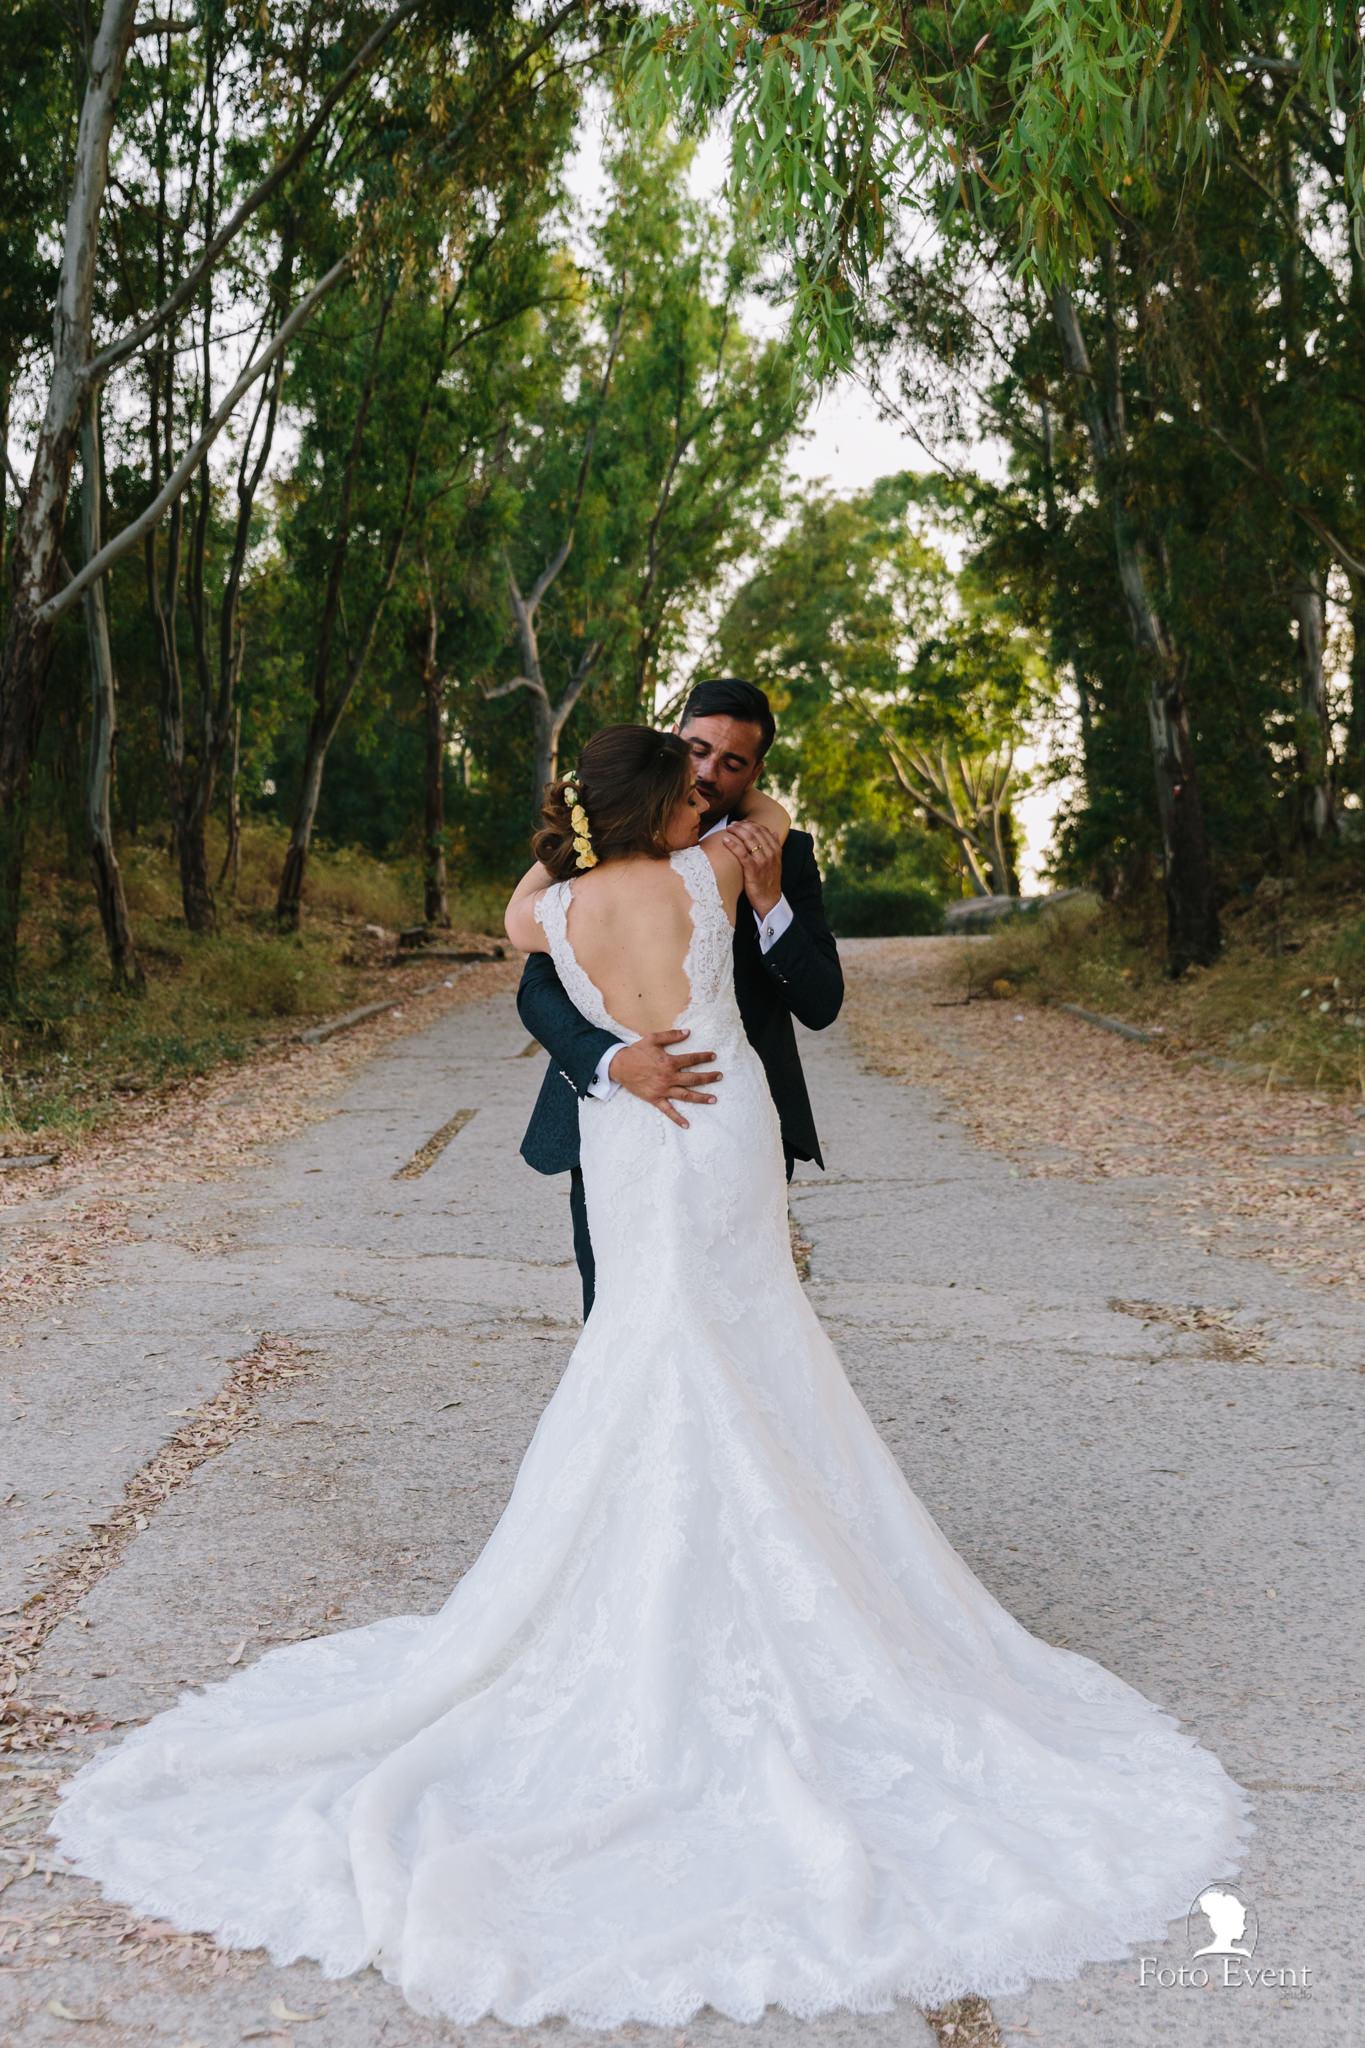 035-2019-06-12-Matrimonio-Rosa-e-Angelo-Ripellino-5DE-1352